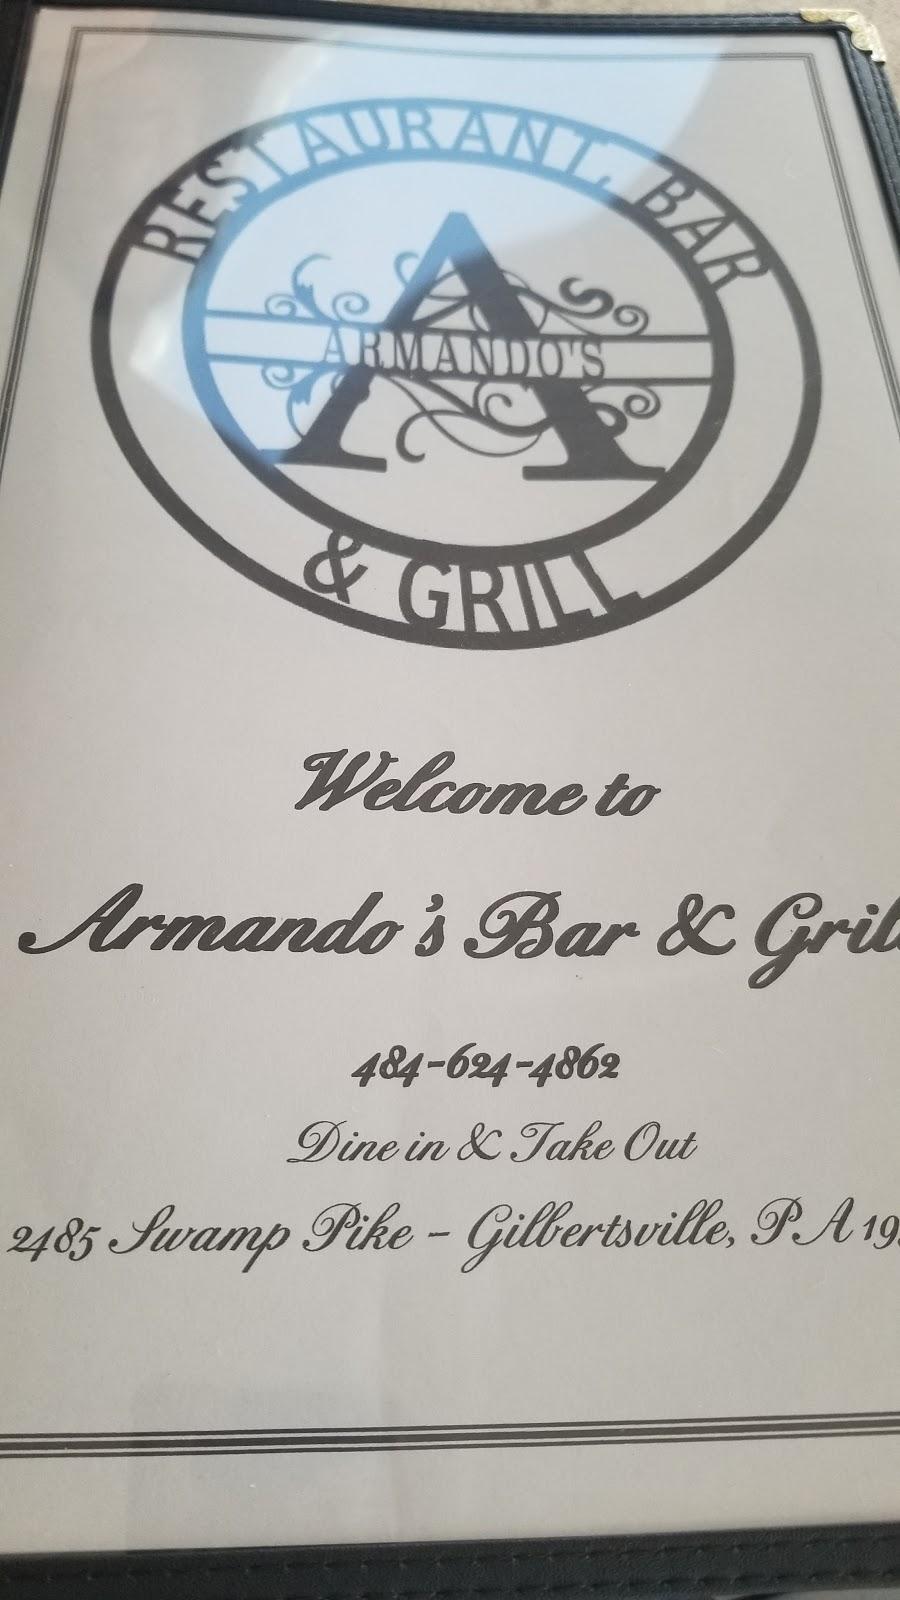 Armandos Restaurant Bar & Grill   restaurant   2485 Swamp Pike, Gilbertsville, PA 19525, USA   4846244862 OR +1 484-624-4862